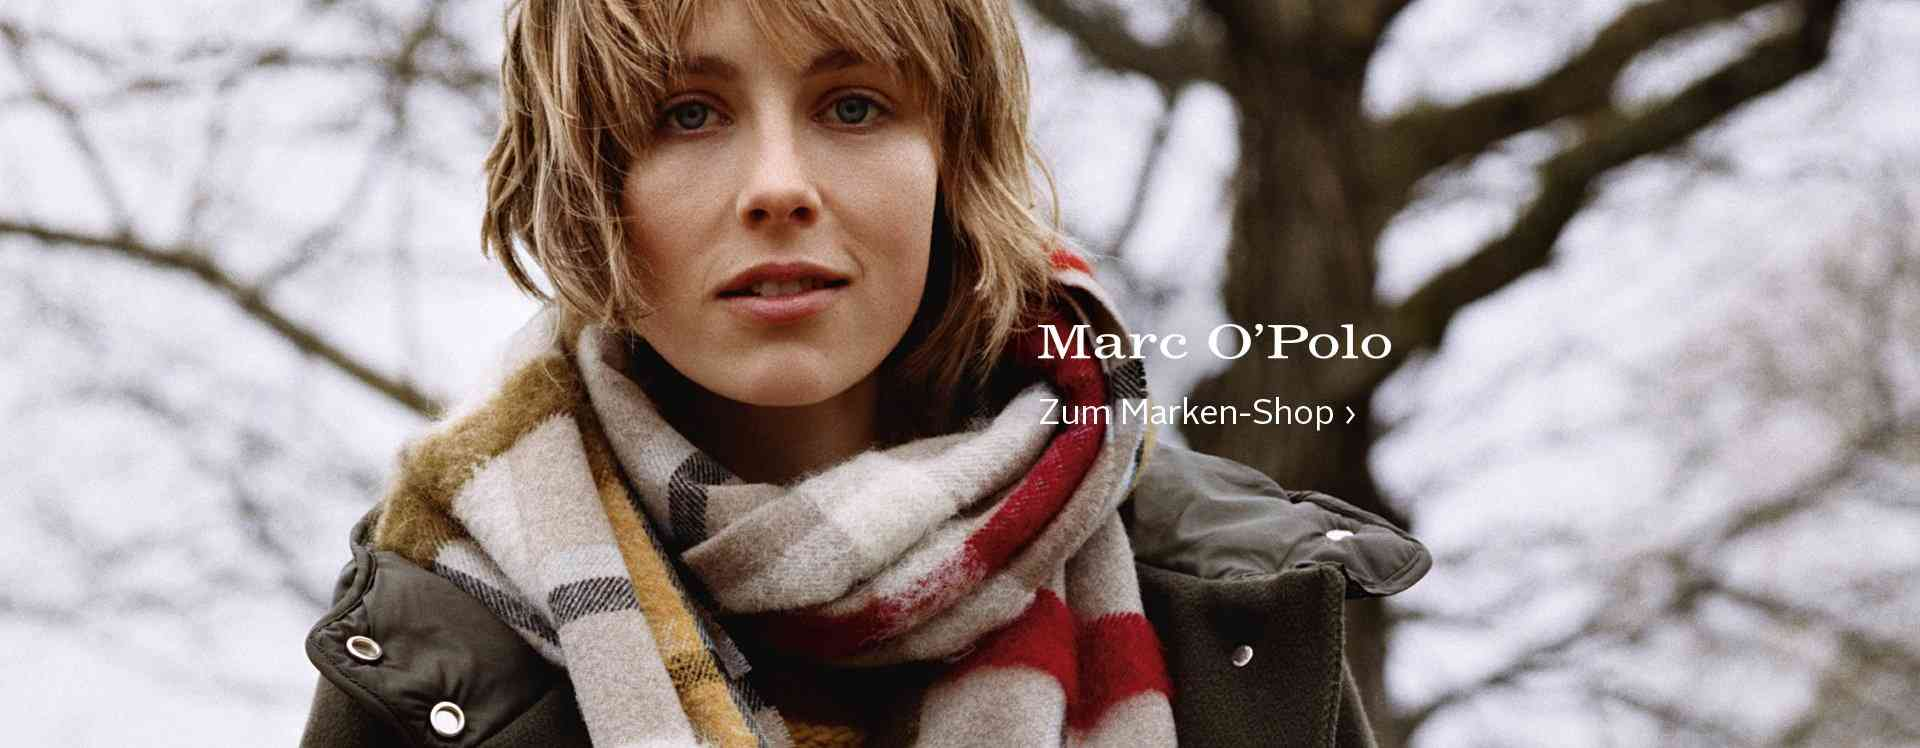 Zum Premium-Markenshop от  Marc O'Polo